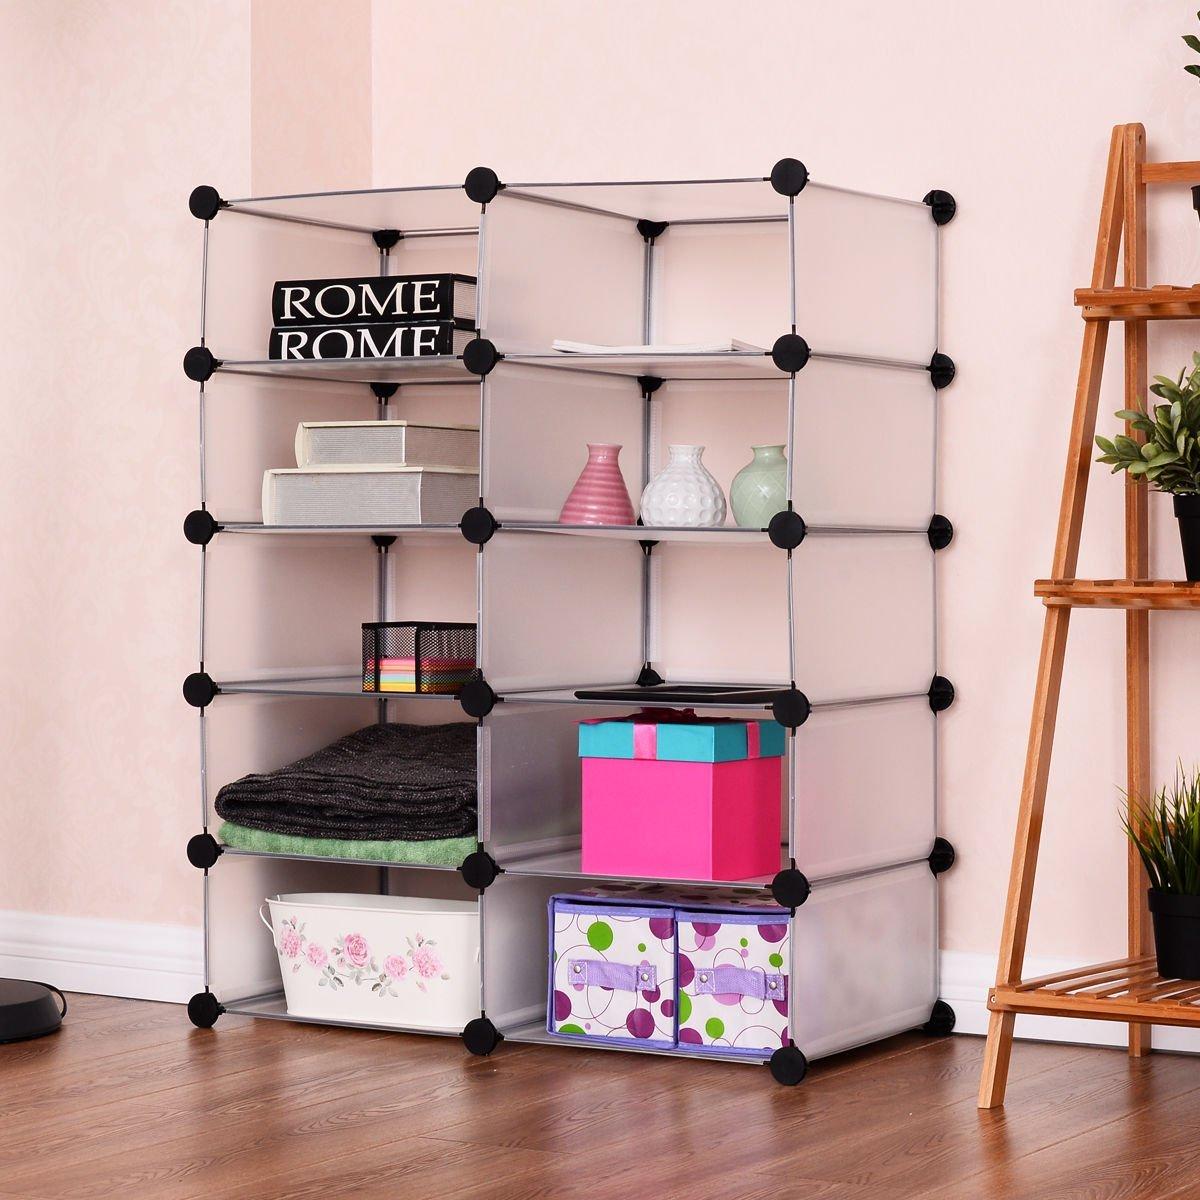 Storage Cube Organizer Closet 10 Grids Clothes Holder